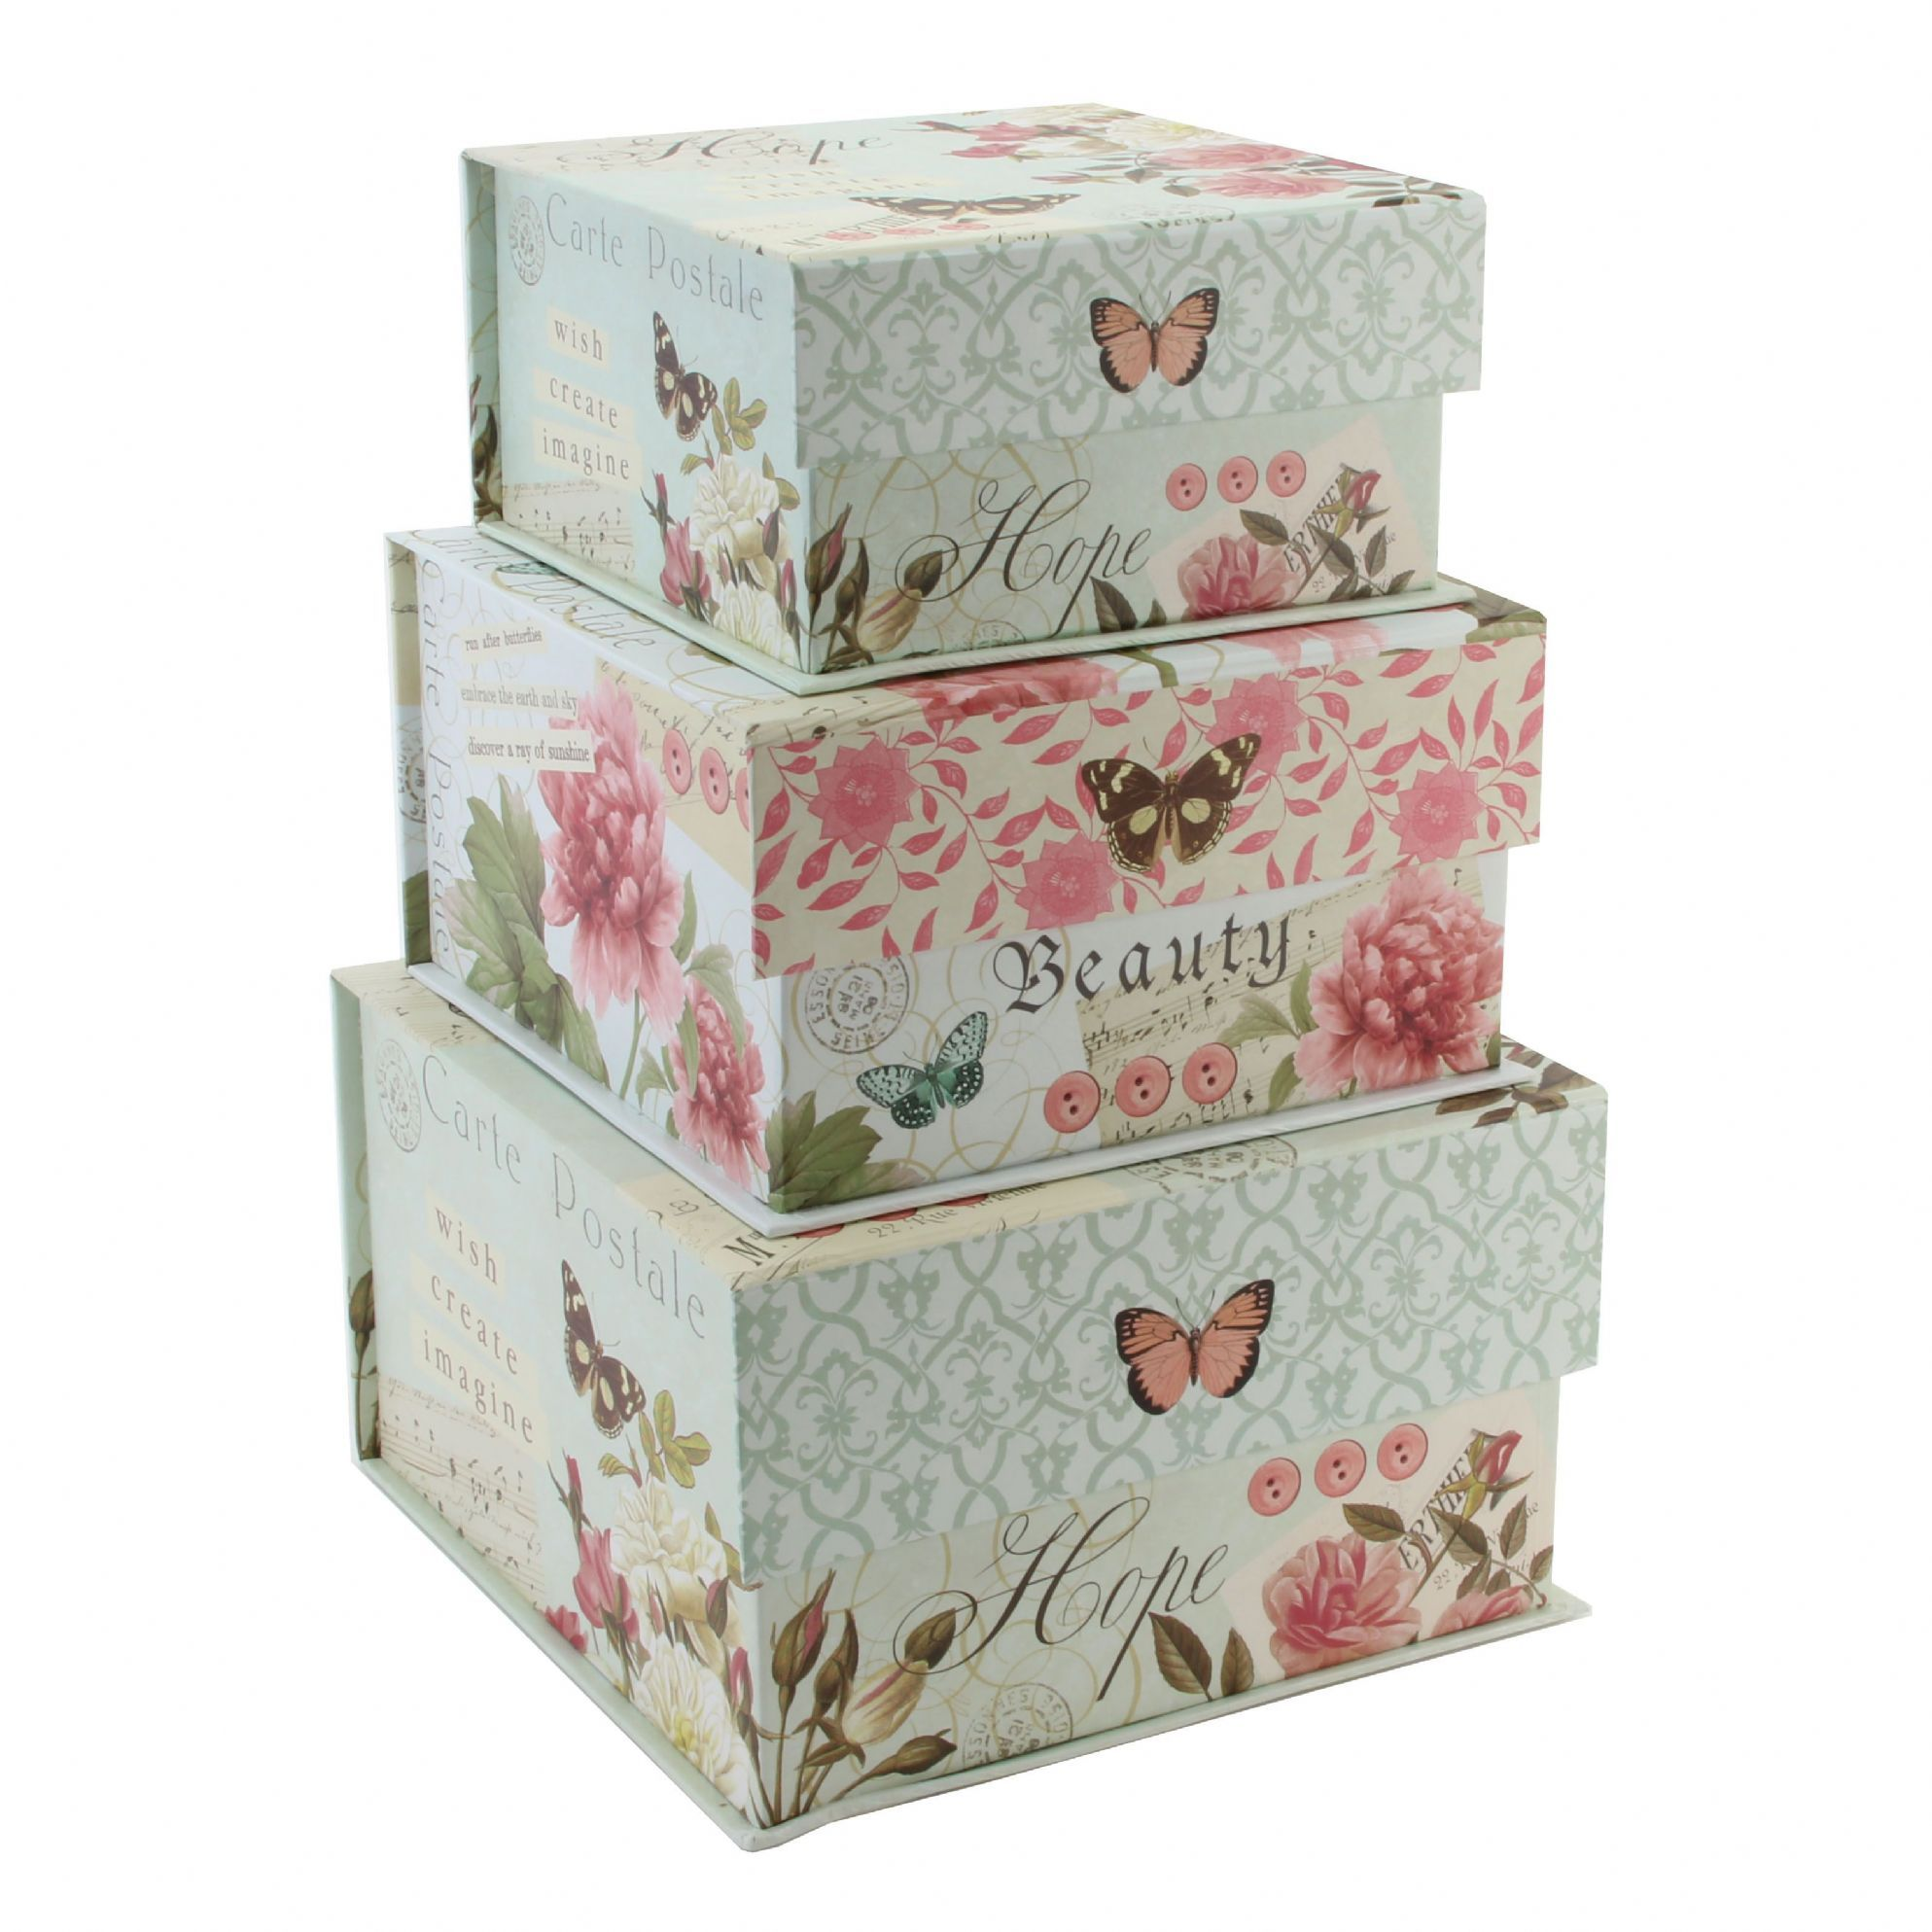 design decorative storage boxes google search boxes decorative storage boxes decorative. Black Bedroom Furniture Sets. Home Design Ideas